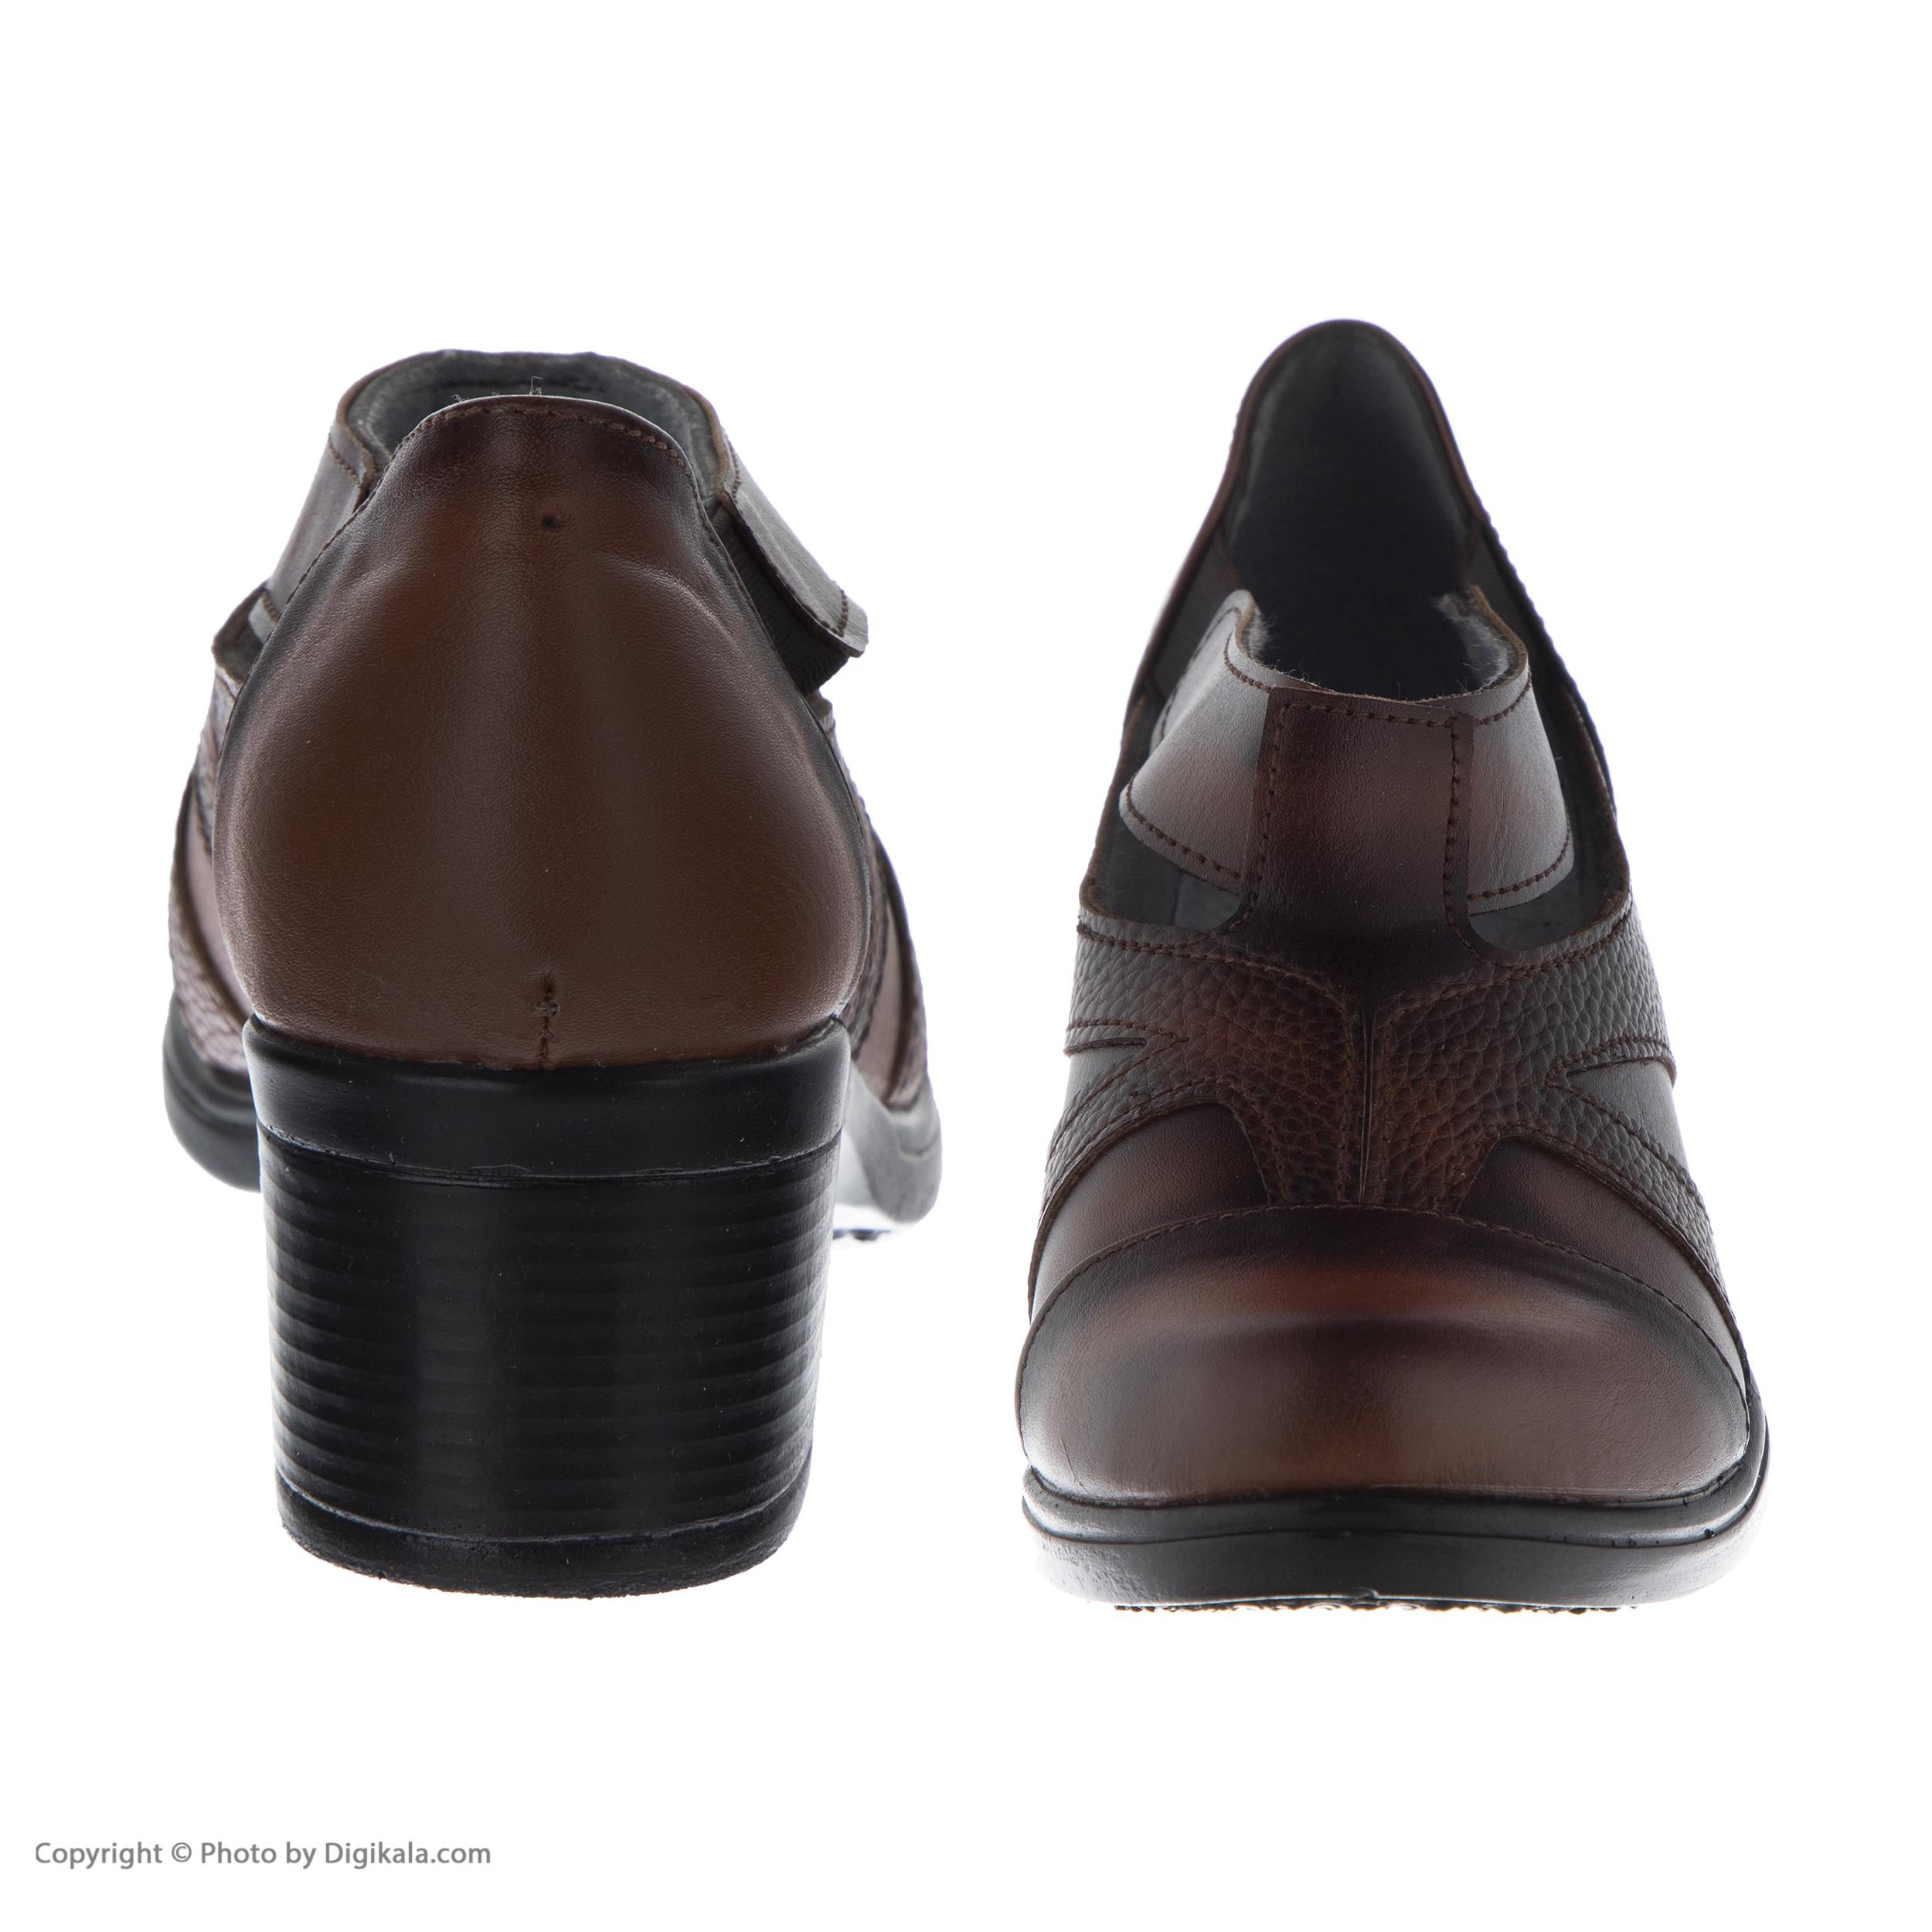 کفش نه طبی سینا مدل رها کد 3 رنگ عسلی